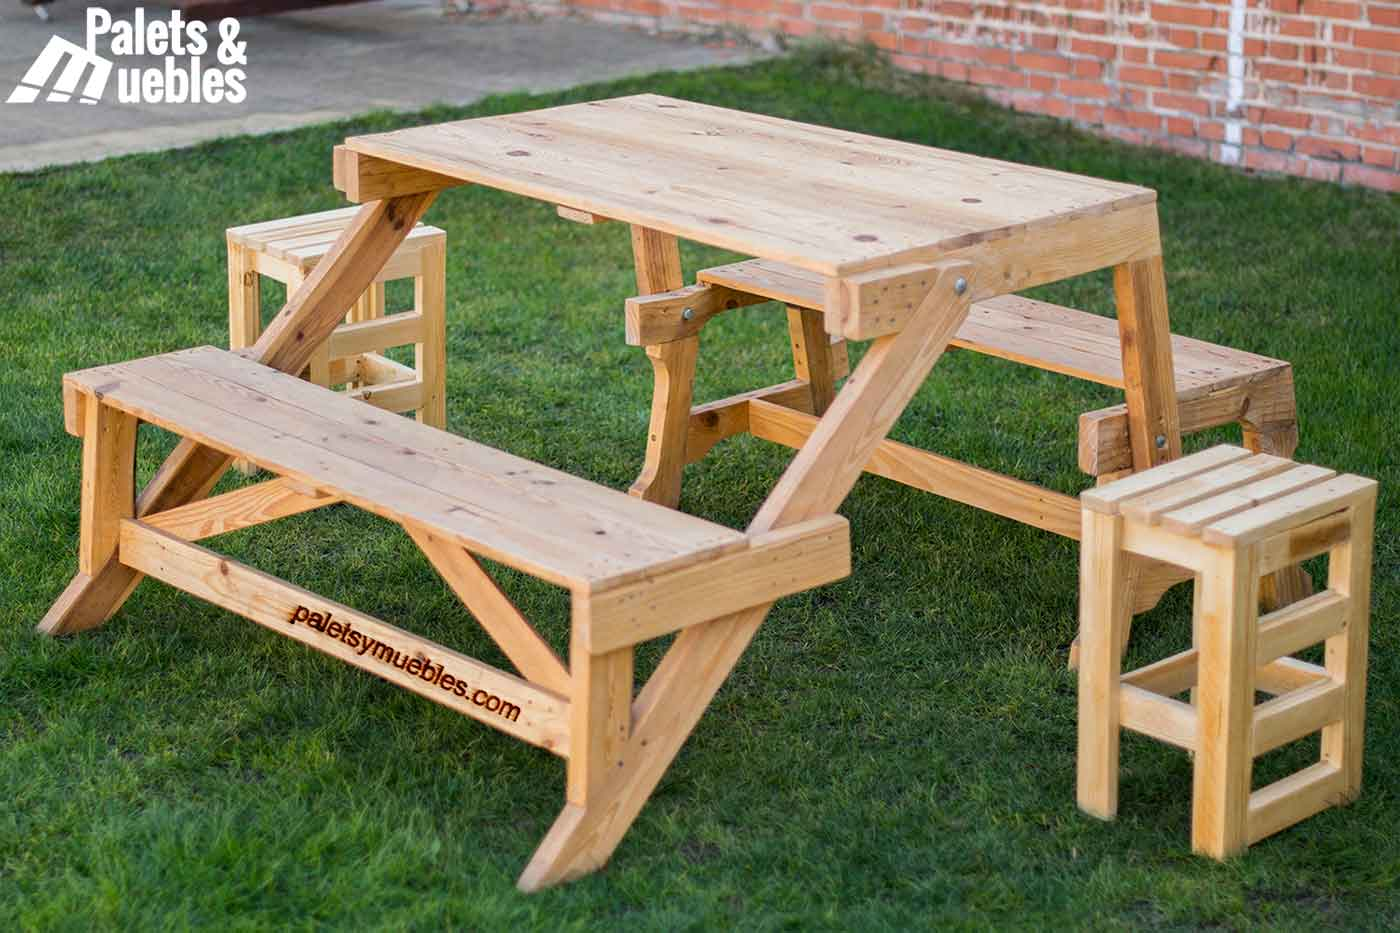 Mesa banco plegable palets ymuebles palets y muebles for Mesa banco madera jardin